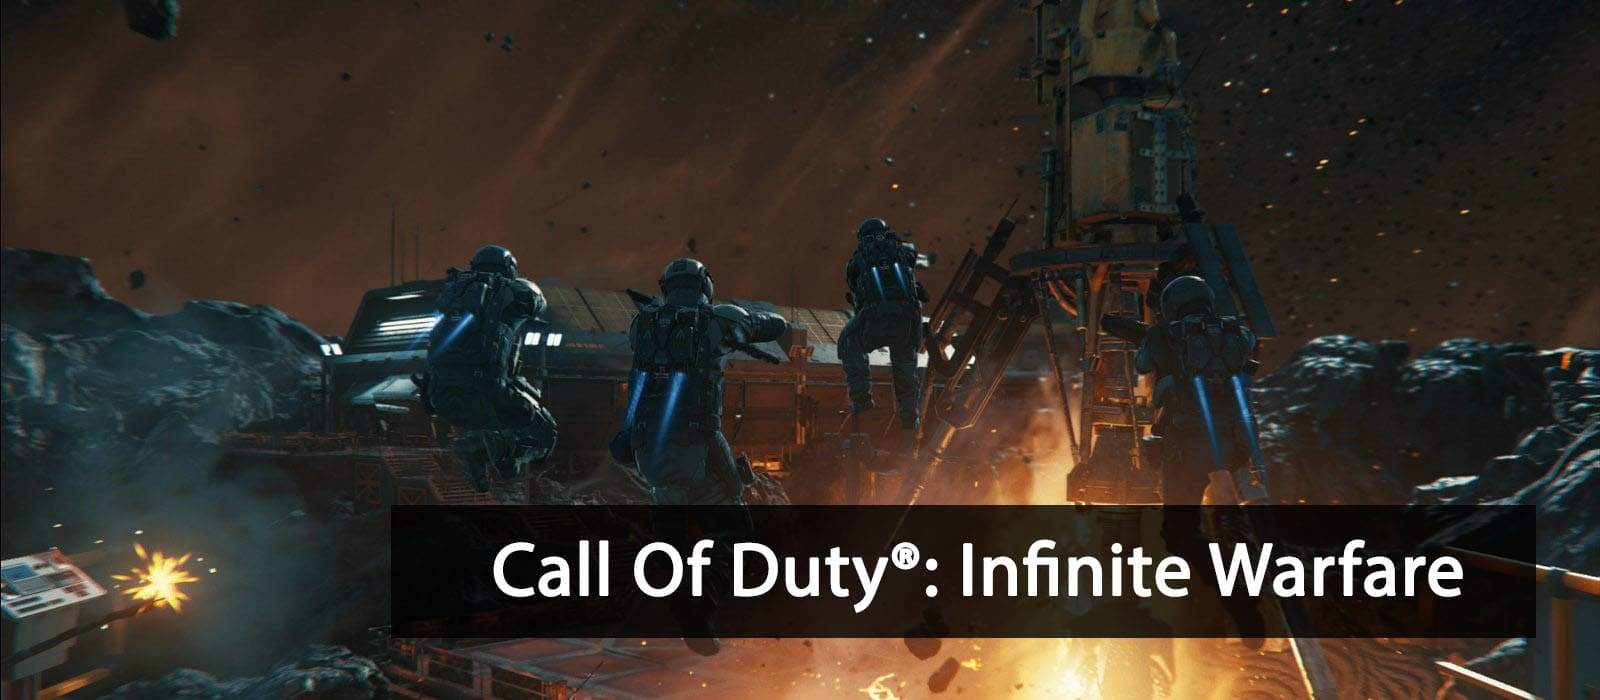 Sony PlayStation 4 Pro Game Call Of Duty: Infinite Warfare